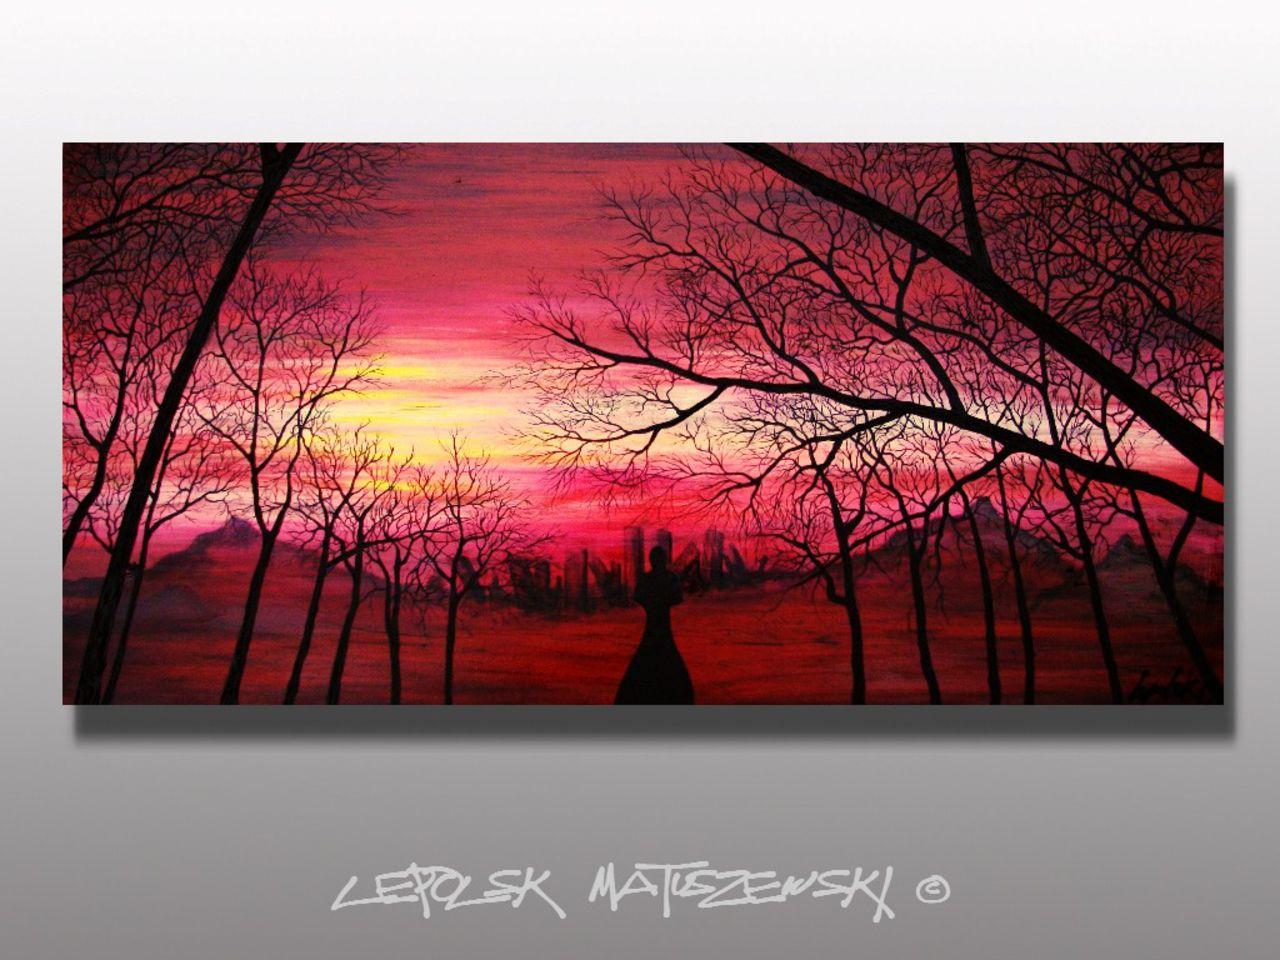 MK  Lepolsk Matuszewski EXCITATORIA LUMINA    art innabstrait Lepolsk Matuszewski